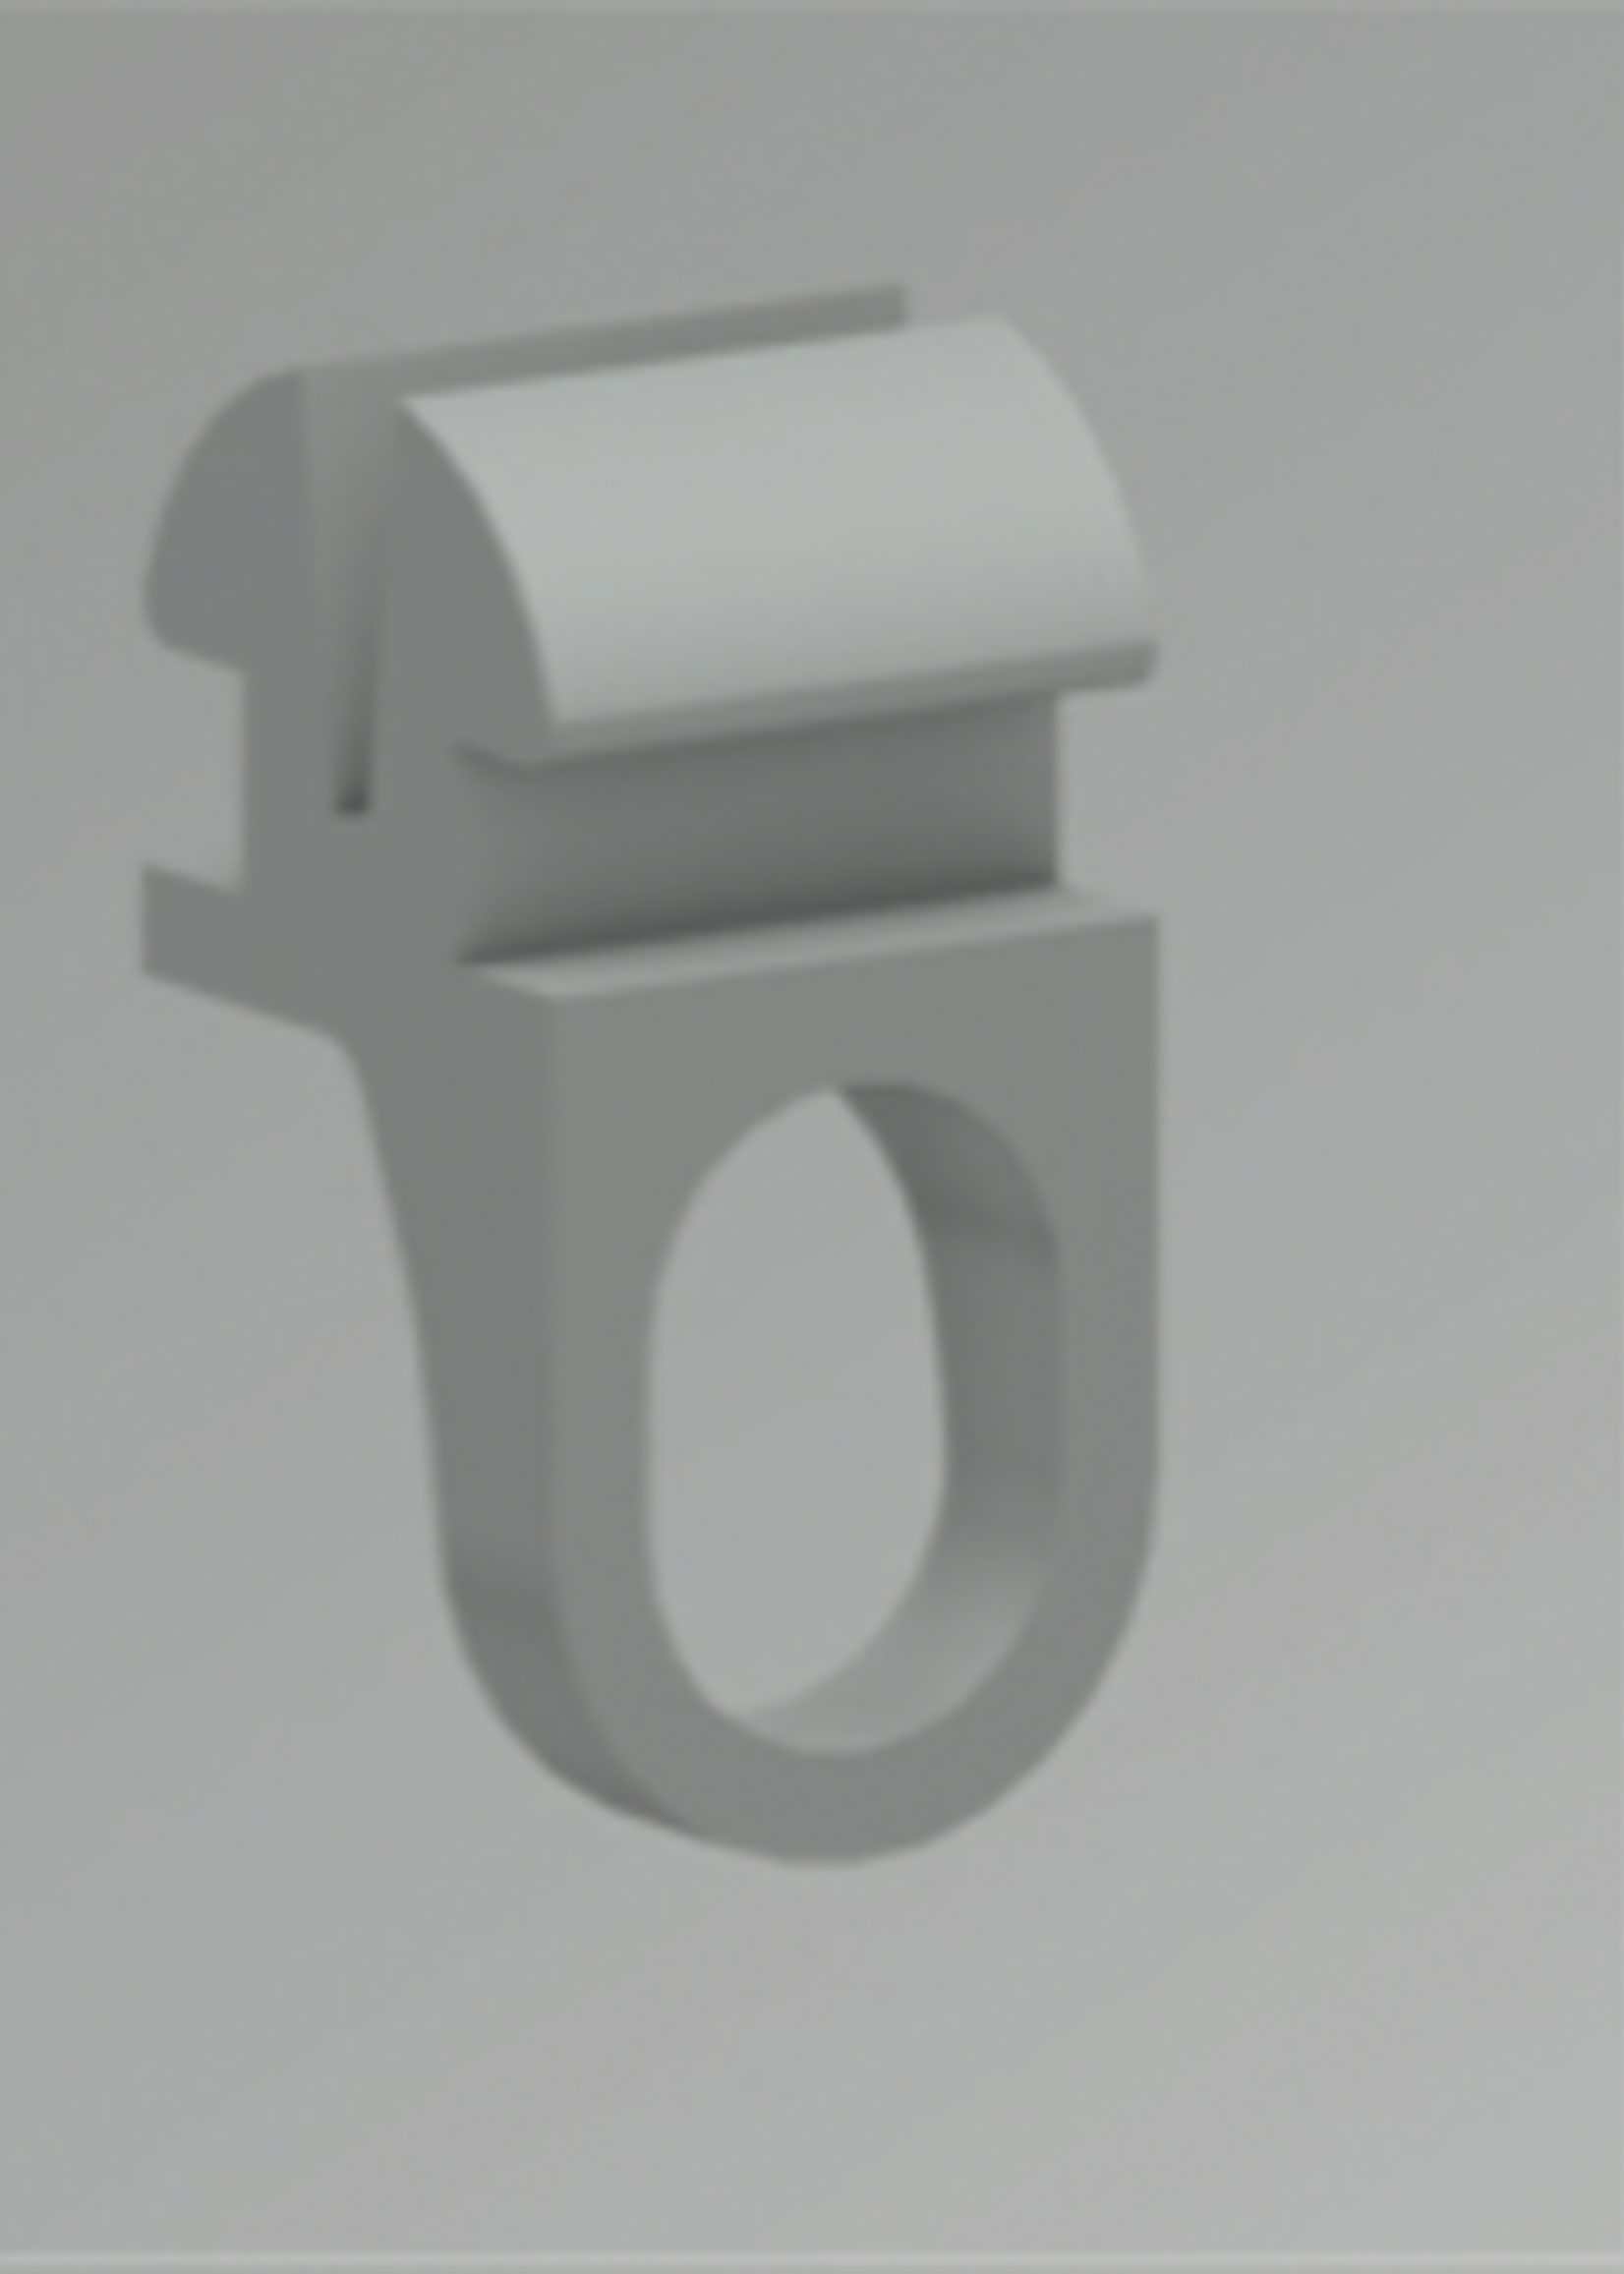 Gordijn Glijder U-Rails (KS) verpakt per 100 stuks